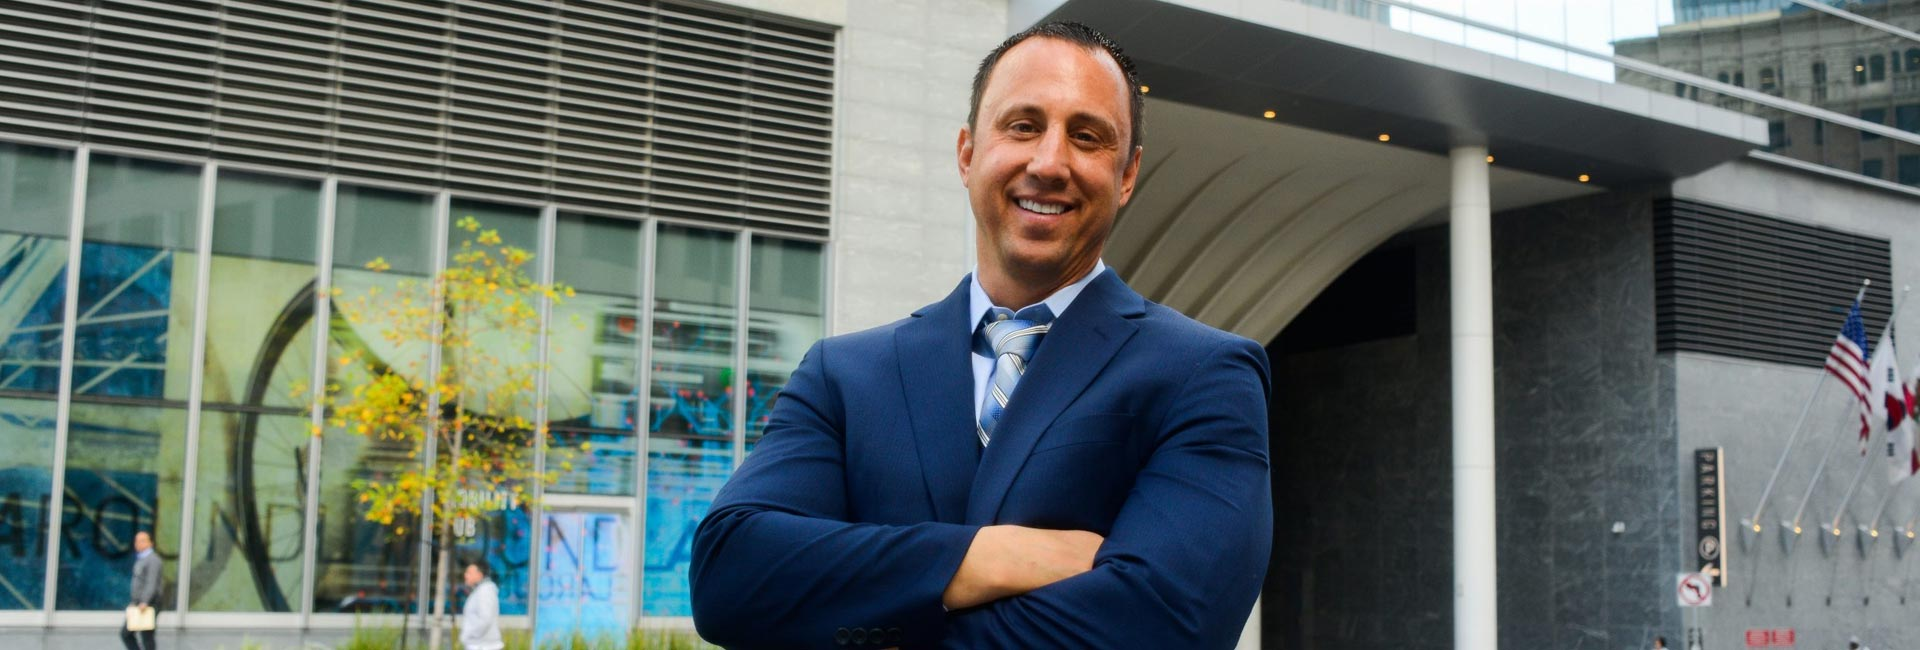 Brian Suder Entrepreneur